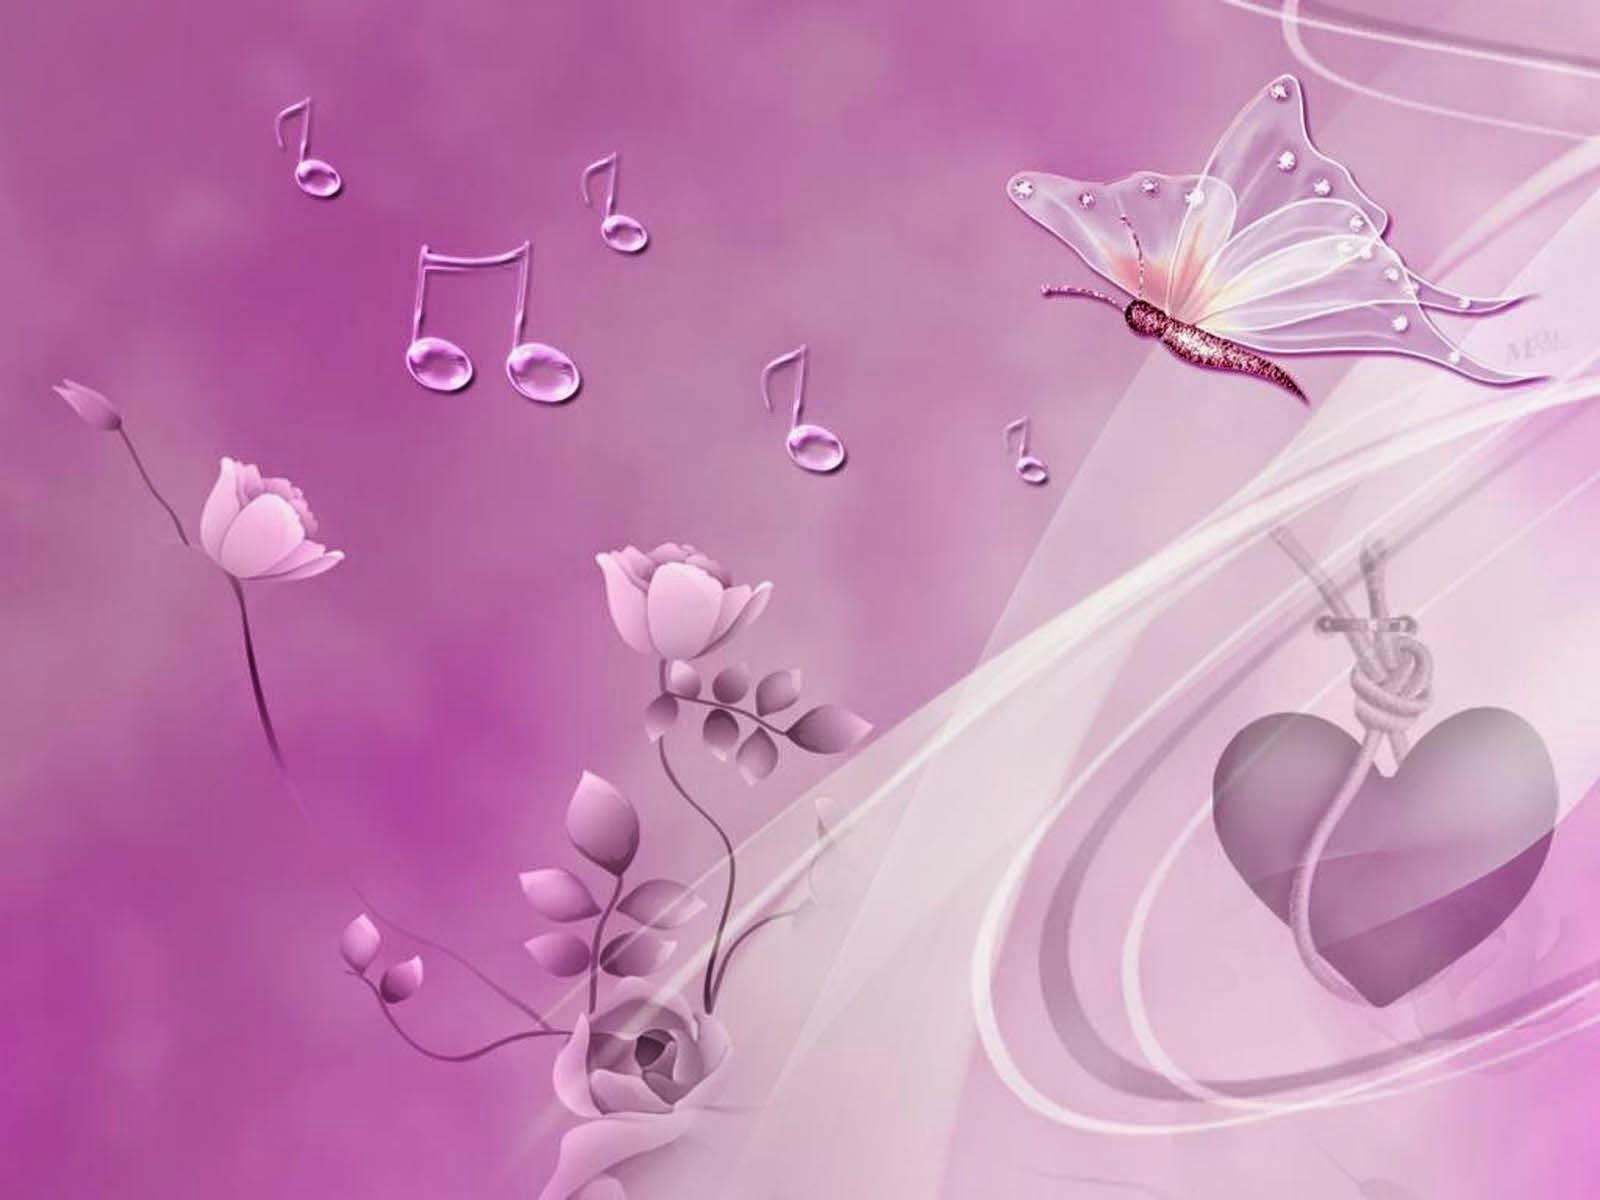 butterfly pictures butterfly wallpaper desktop backgrounds desktop 1600x1200